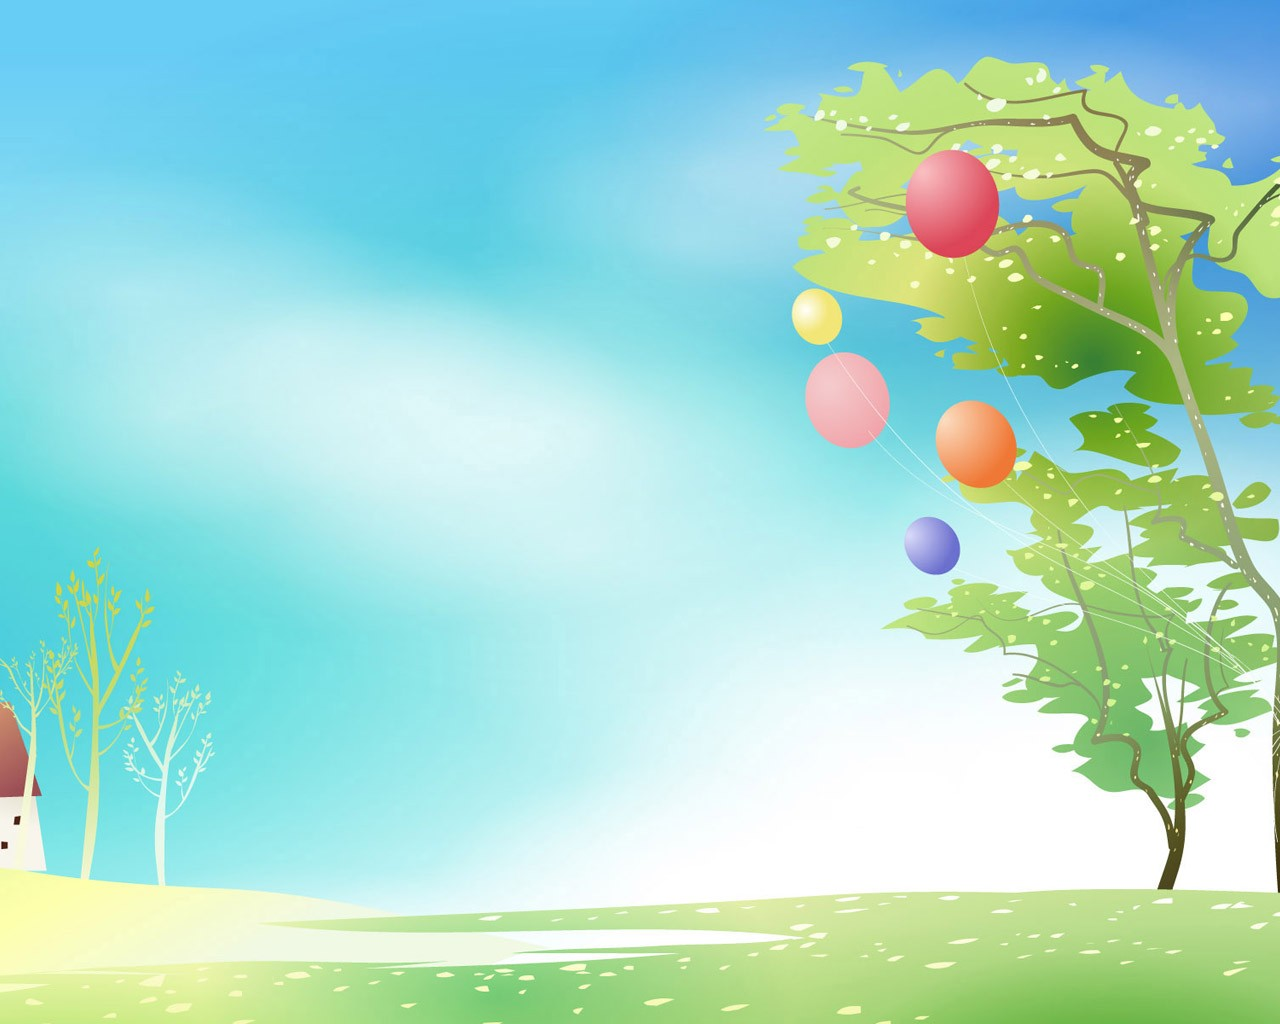 Fairy Tale Cartoon Wallpapers 5 1280x1024 Wallpaper Download Rh V3wall Com